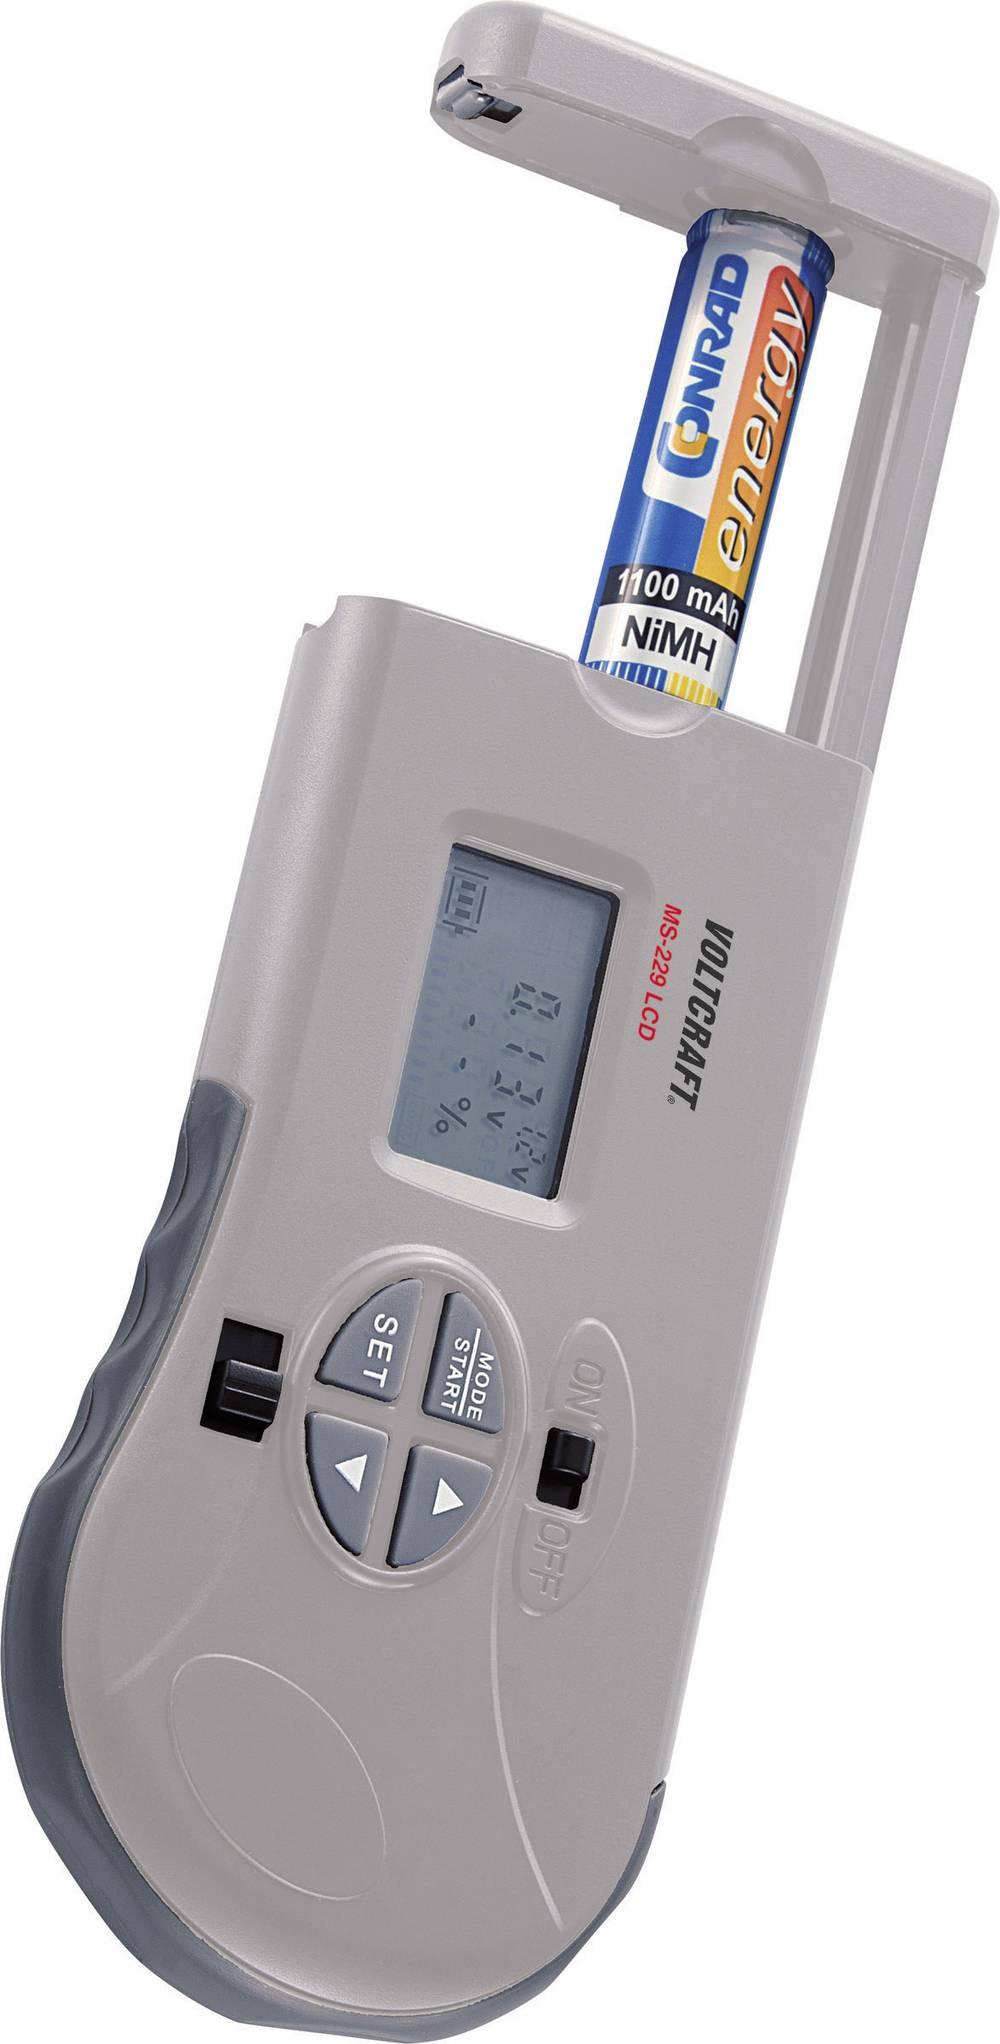 VOLTCRAFT MS-229 LCD baterijski tester za 1,2 - 12 V baterije/akumulatorje